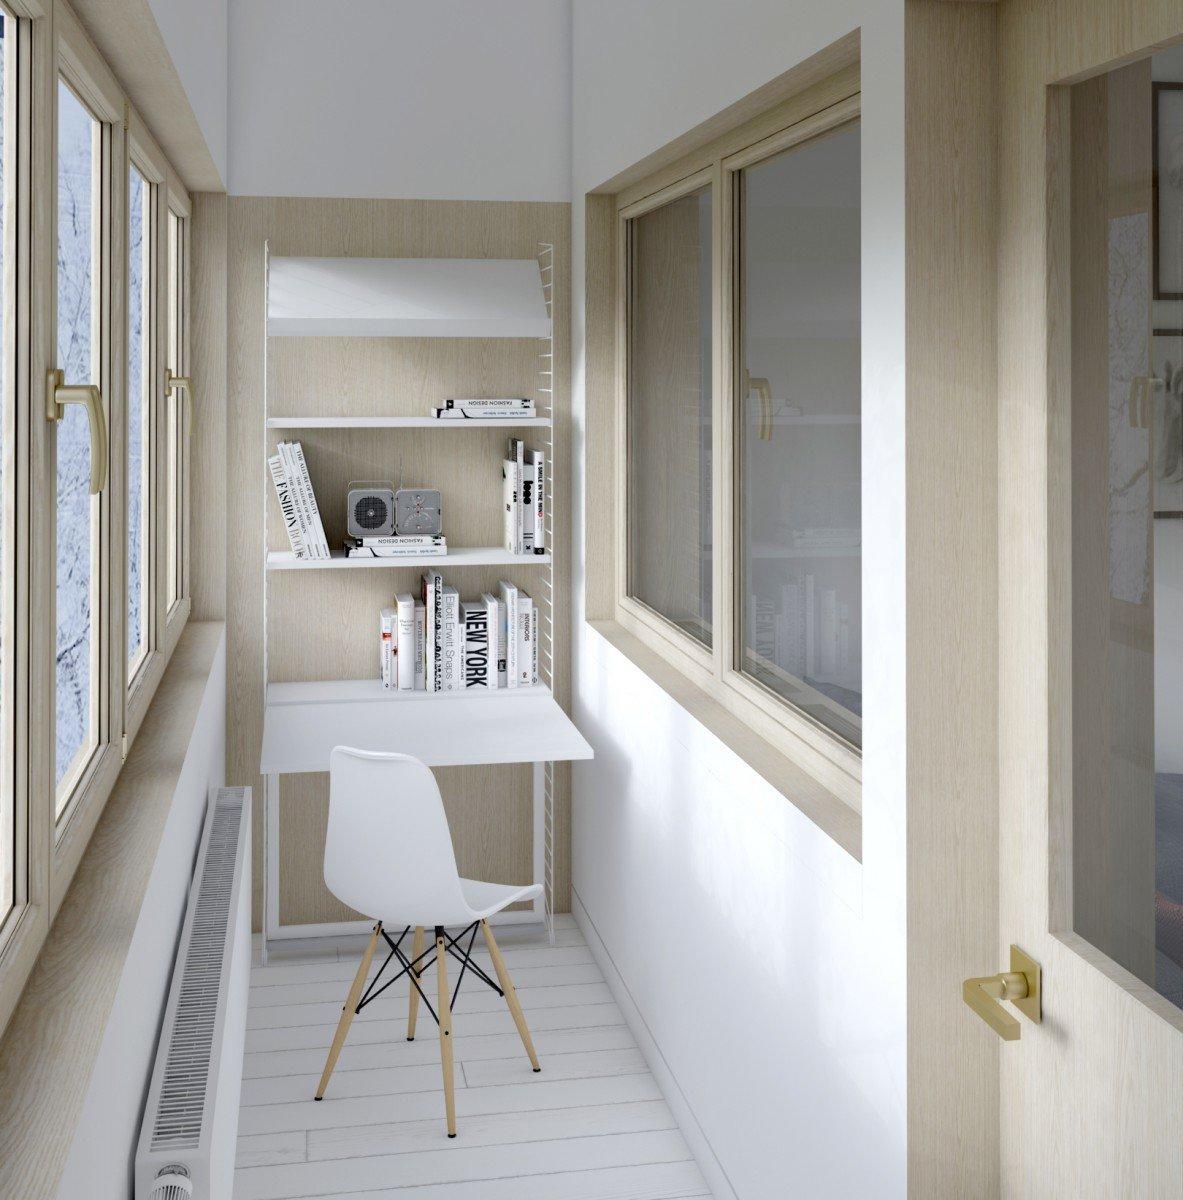 Балкон и терраса, стиль: современный, современный, современн.